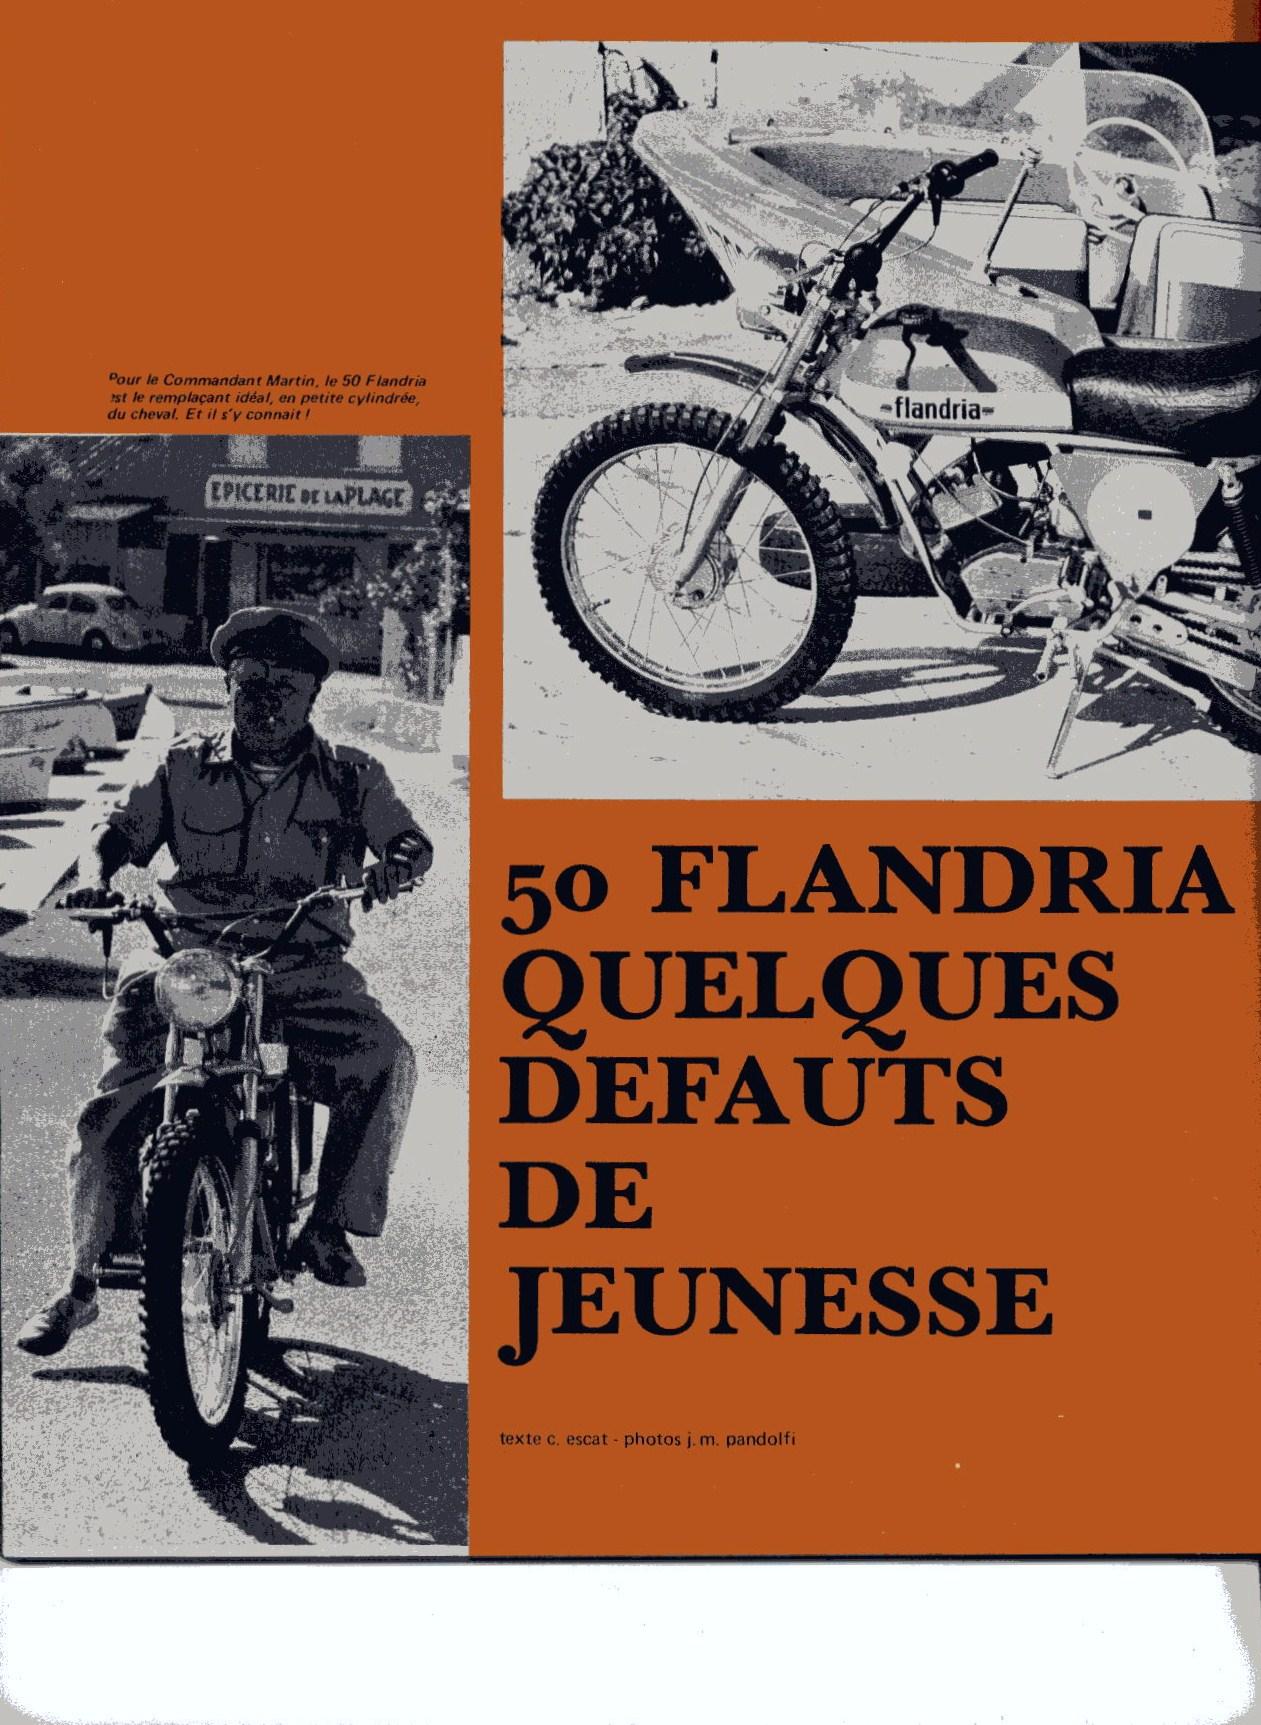 FLANDRIA SCORPION Flandr62